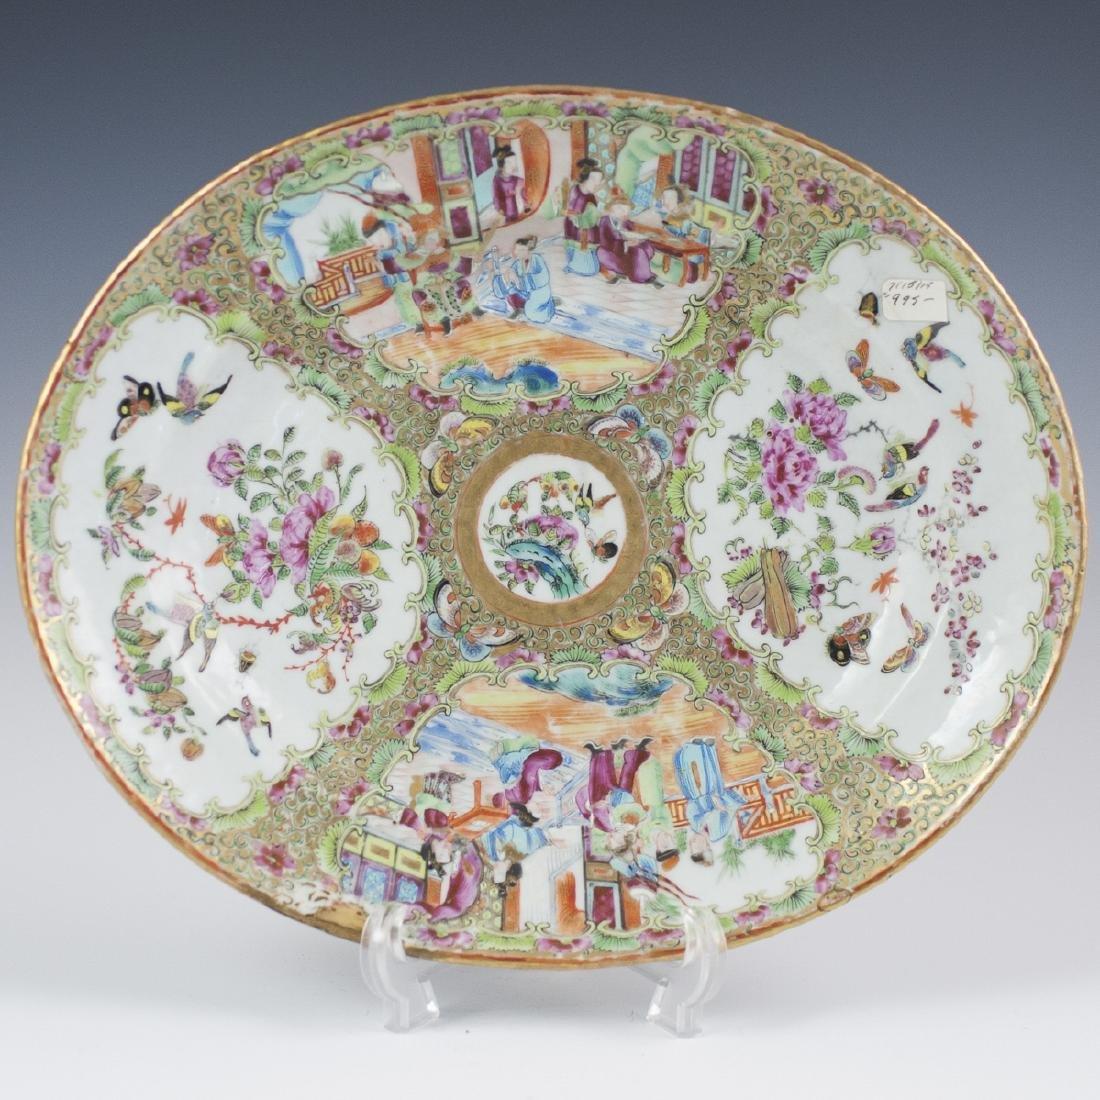 Chinese Porcelain Rose Medallion Tray